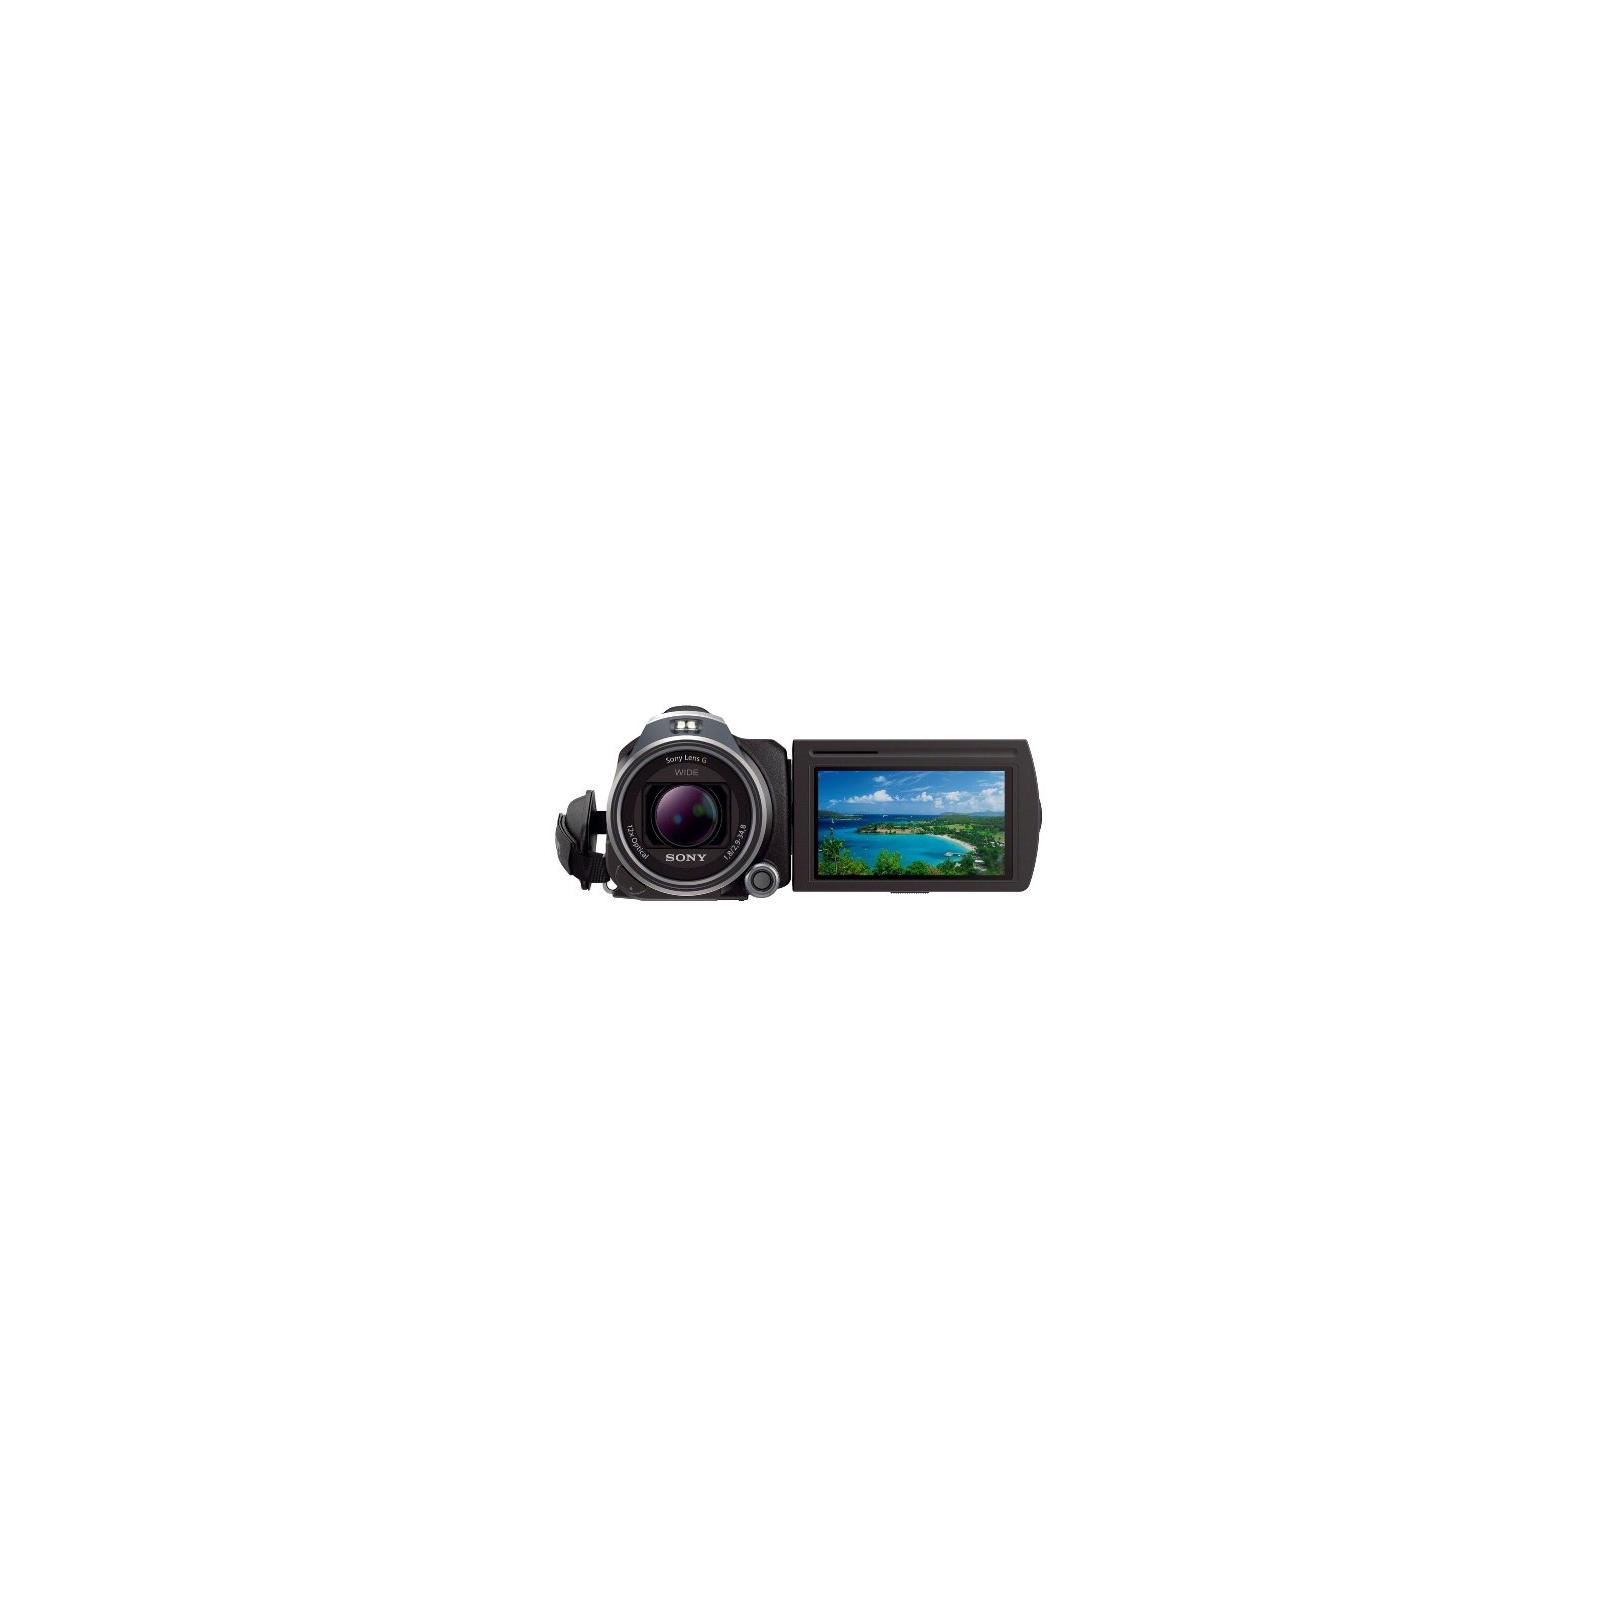 Цифровая видеокамера SONY Handycam HDR-PJ810 Black (HDRPJ810EB.CEL) изображение 4